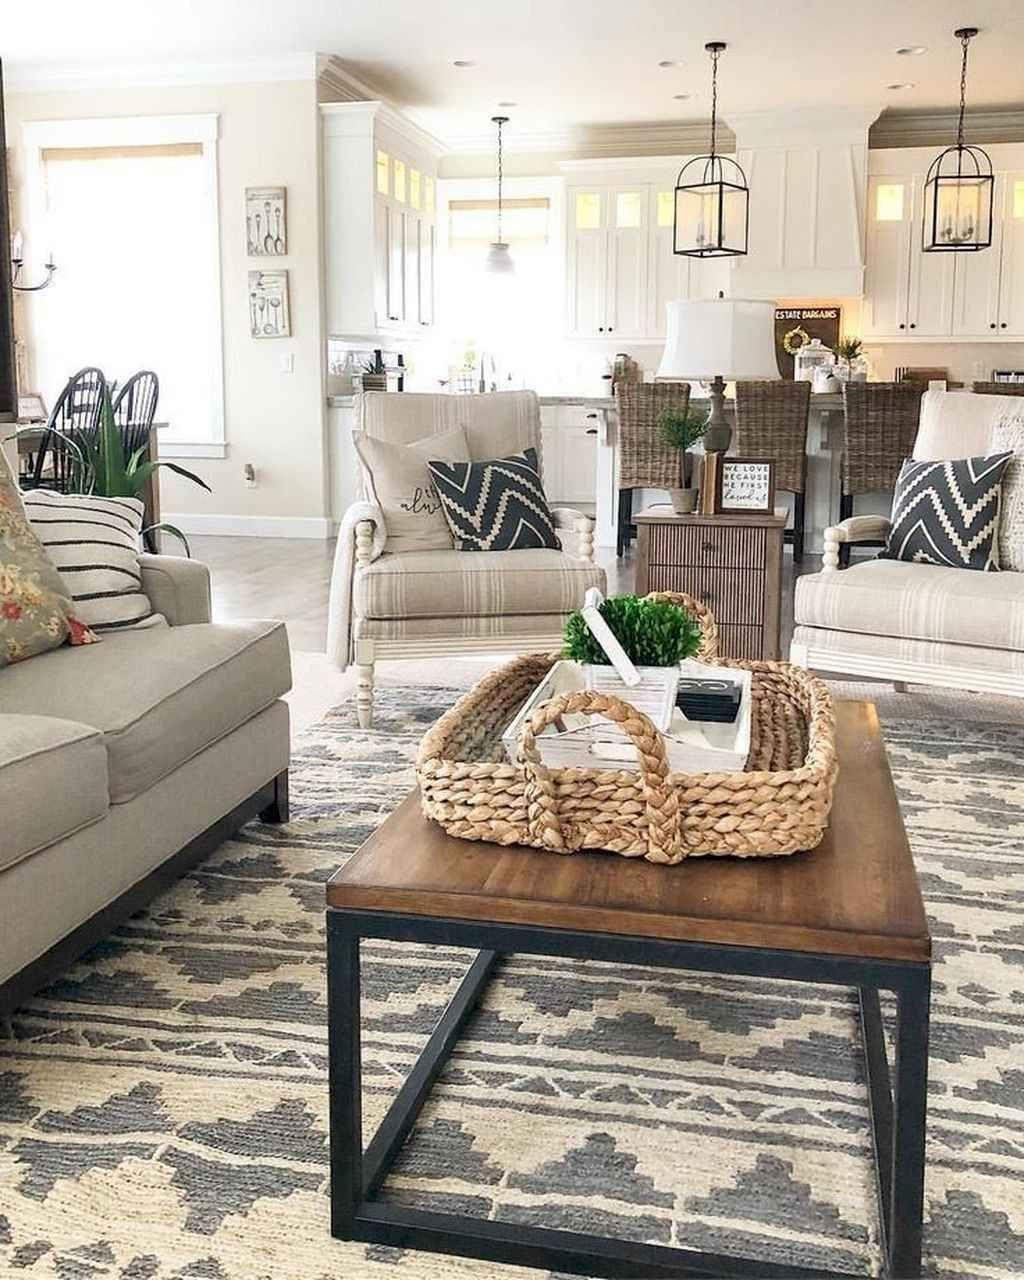 01 Best Modern Small Living Room Decor Ideas In 2020